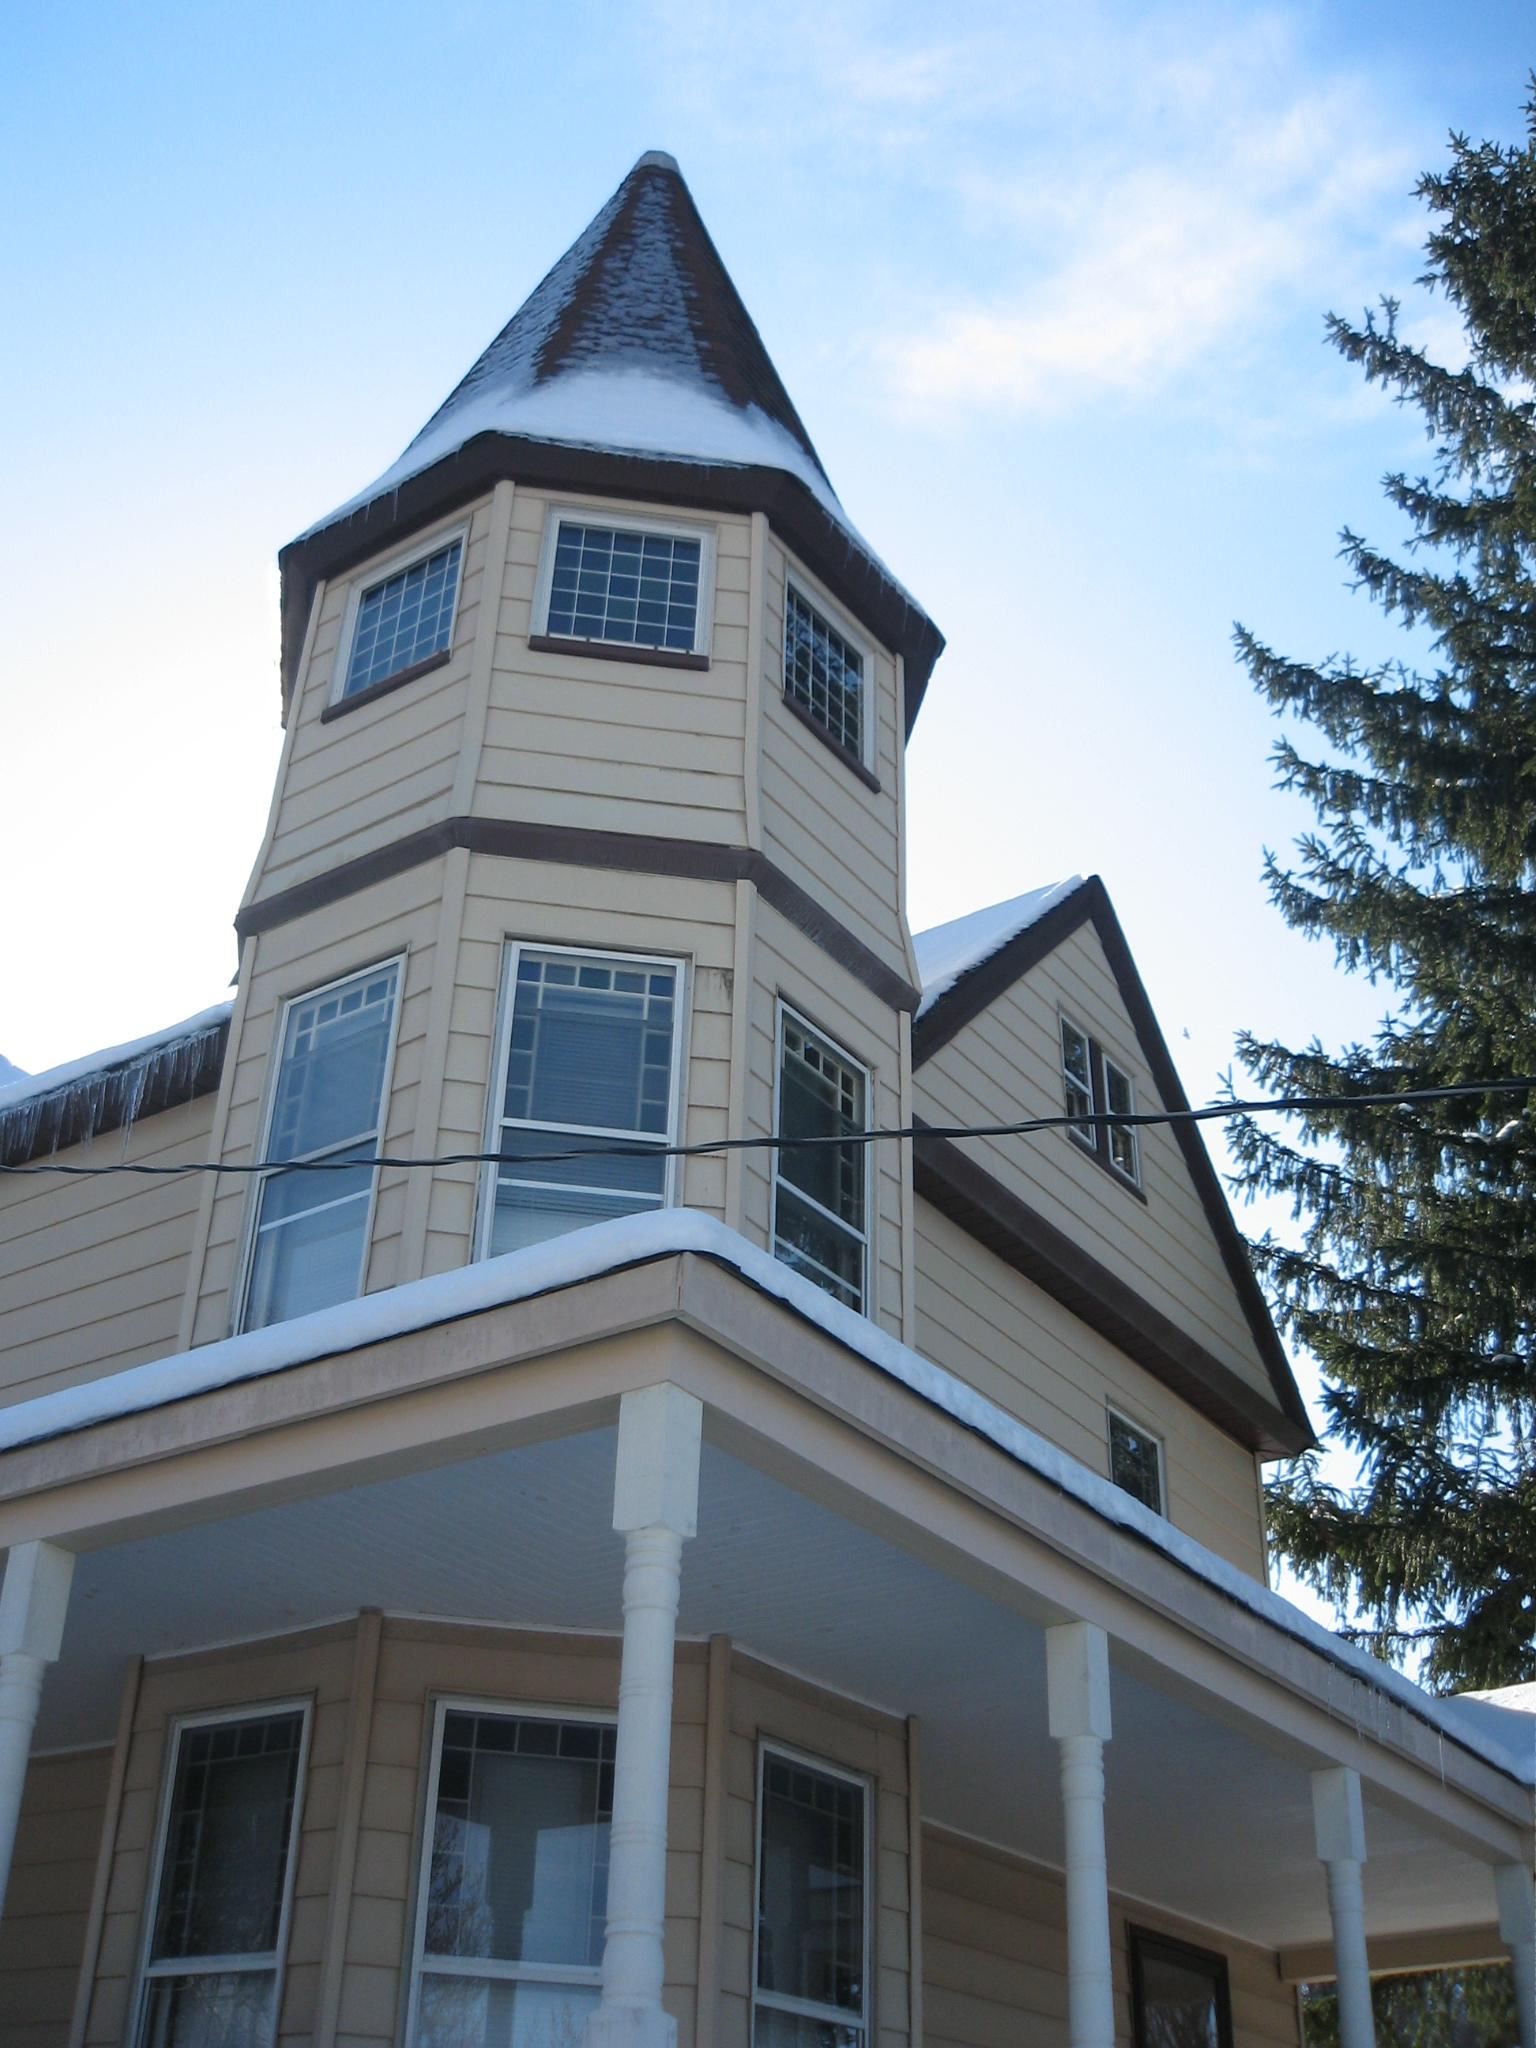 1860s house with vinyl-img_0651_1.jpg